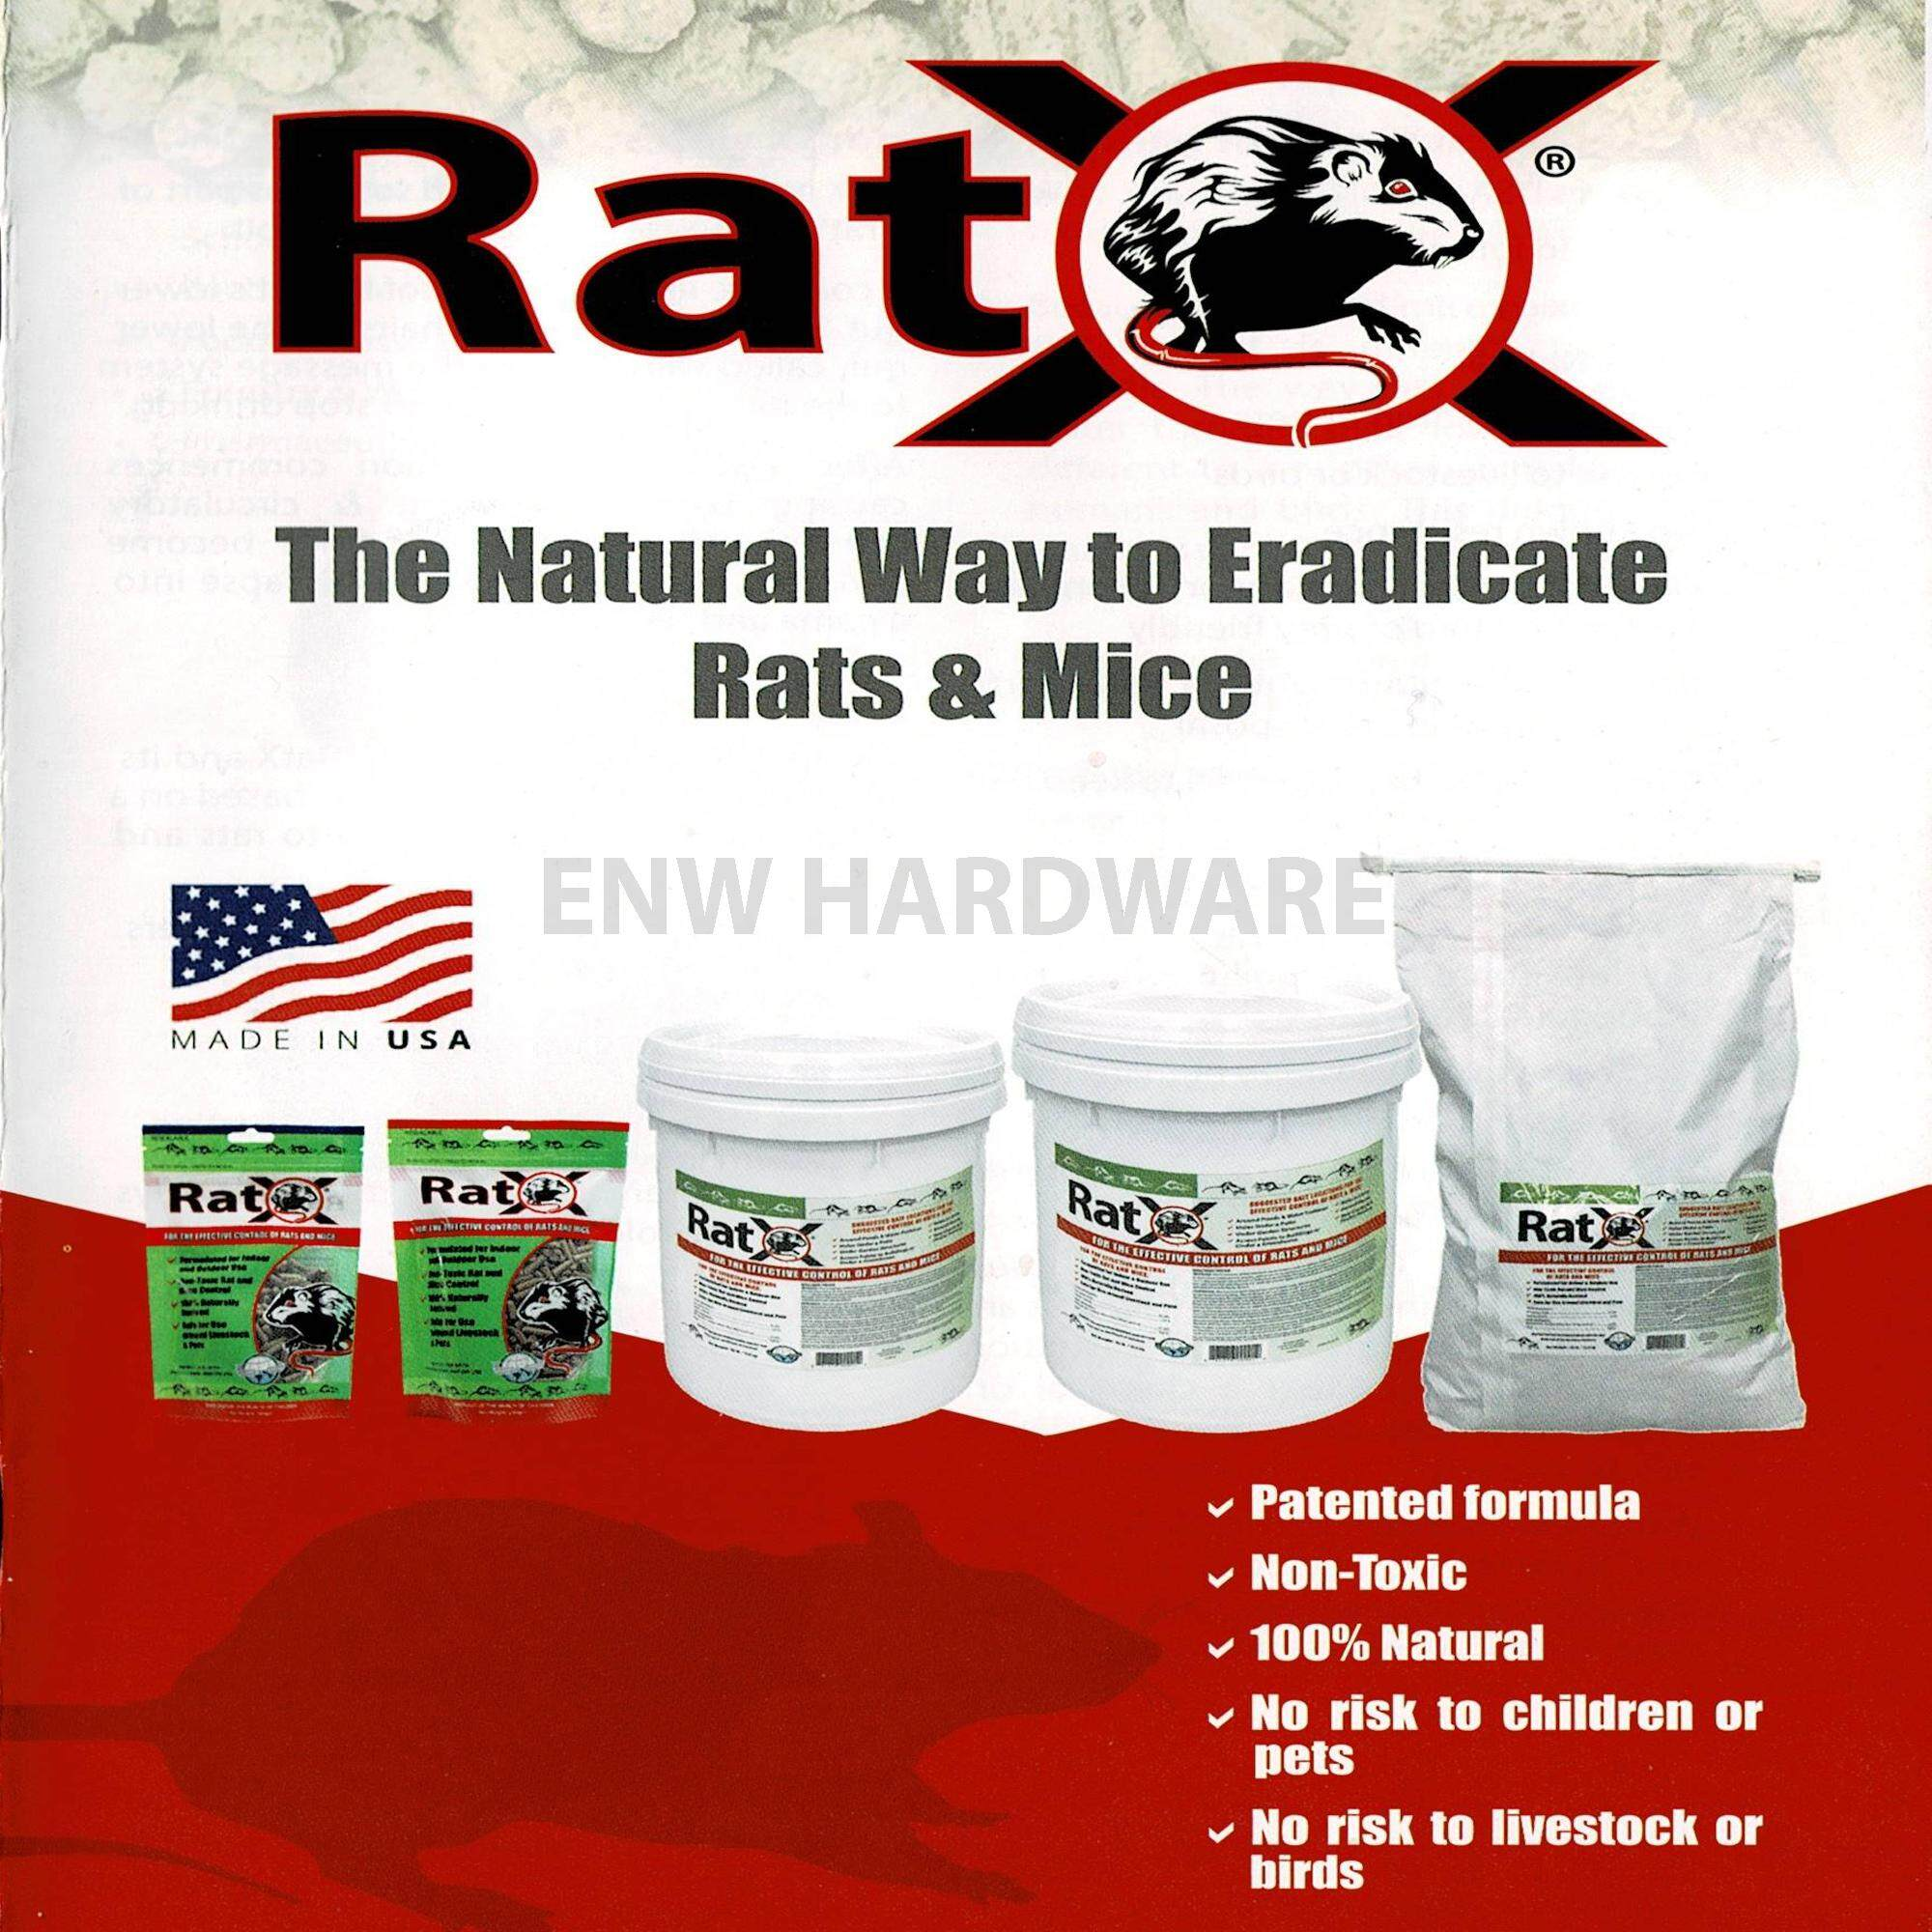 RatX Rodent Bait 100gm - Non-toxic